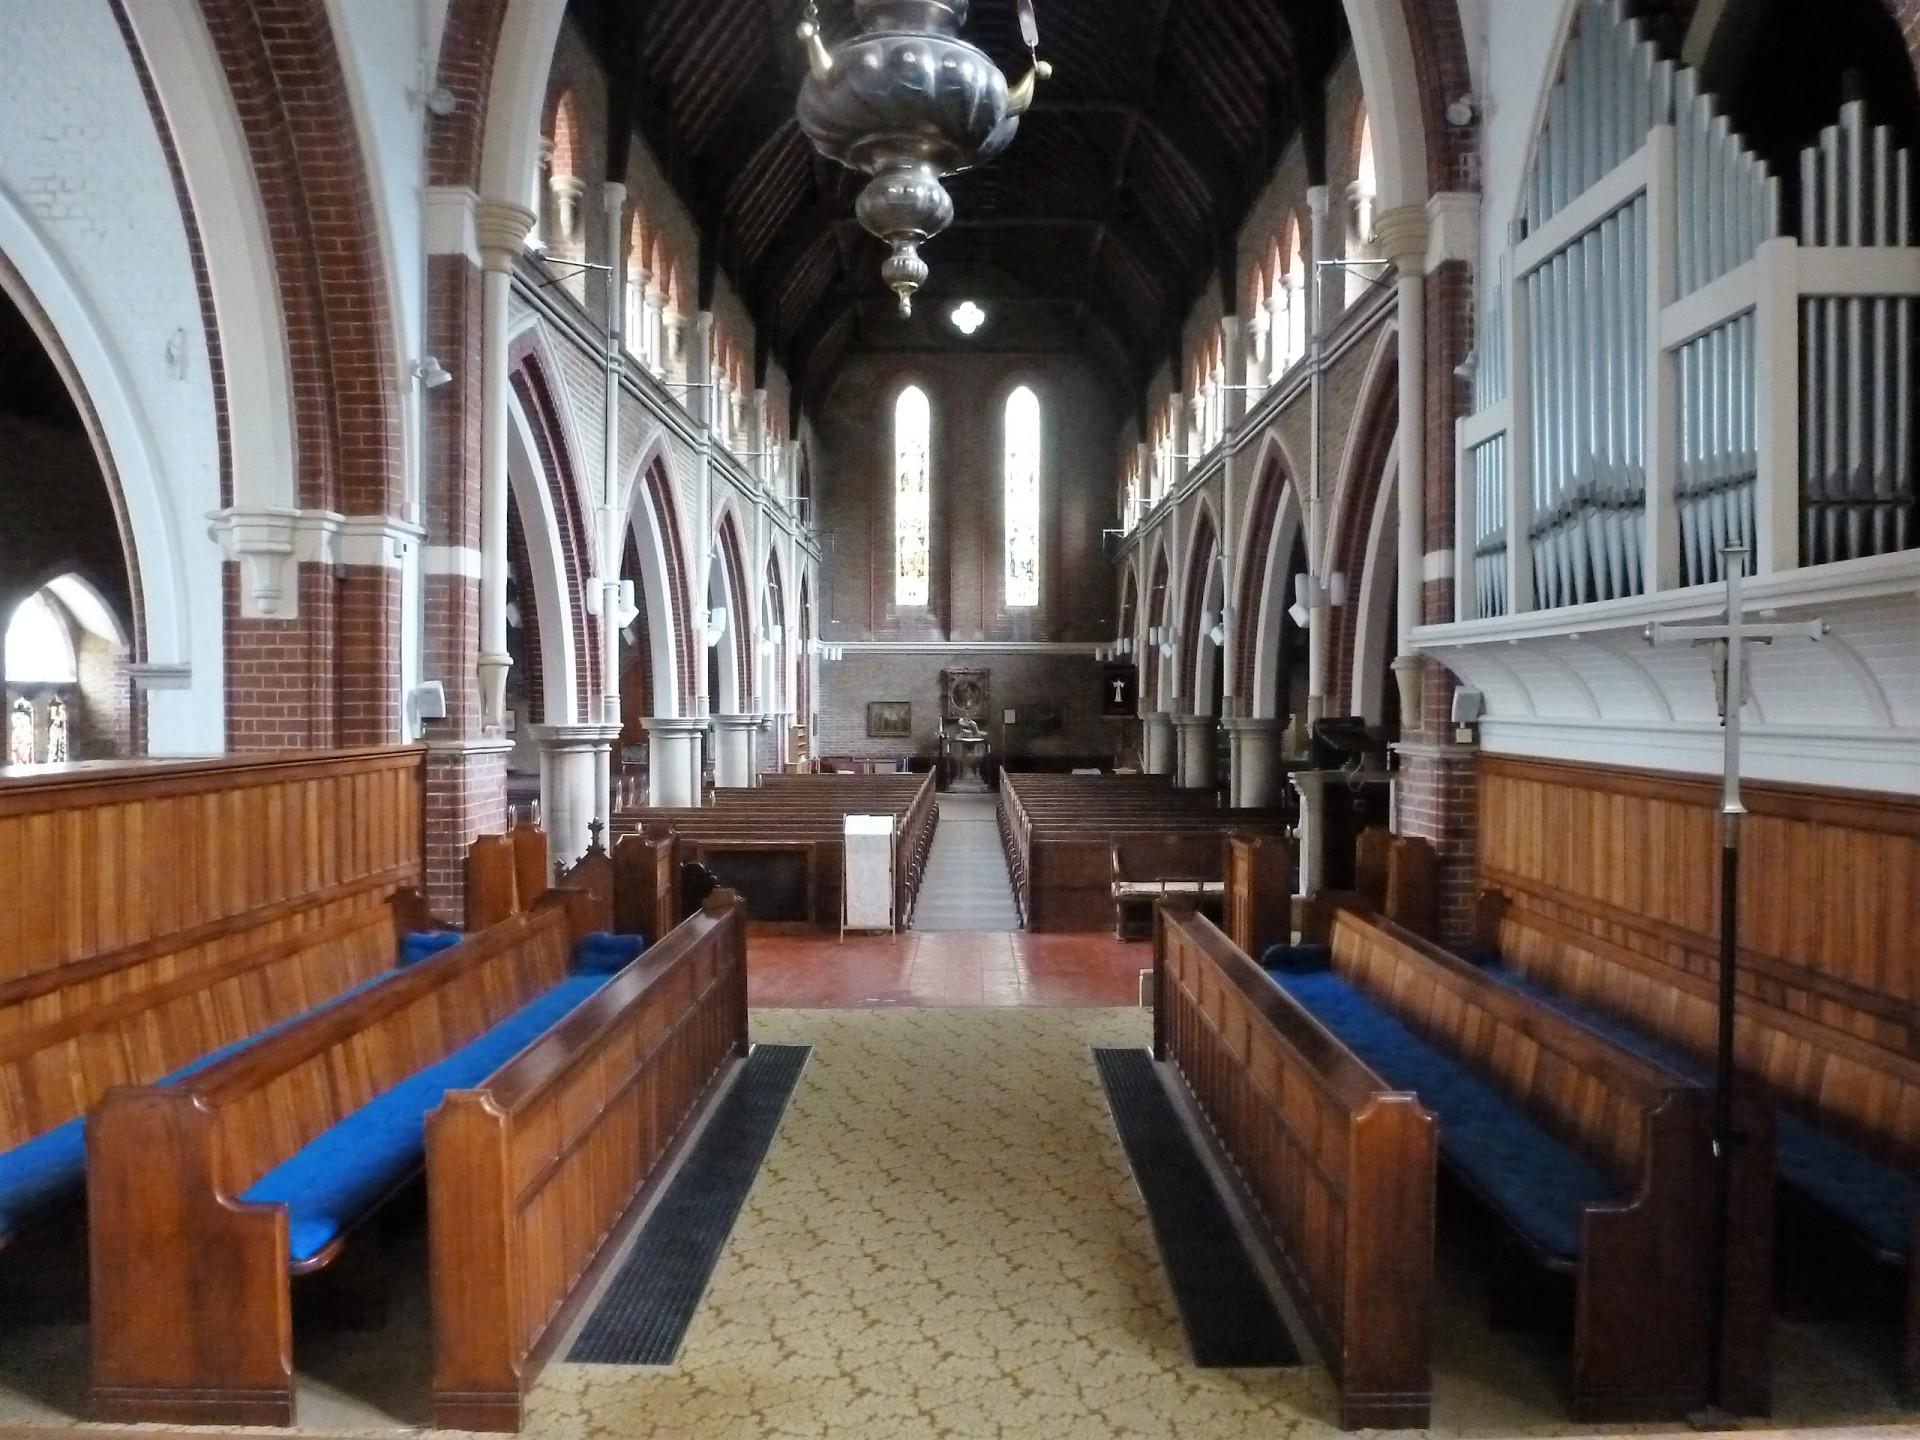 Interior view of St. Botolph's, Heene